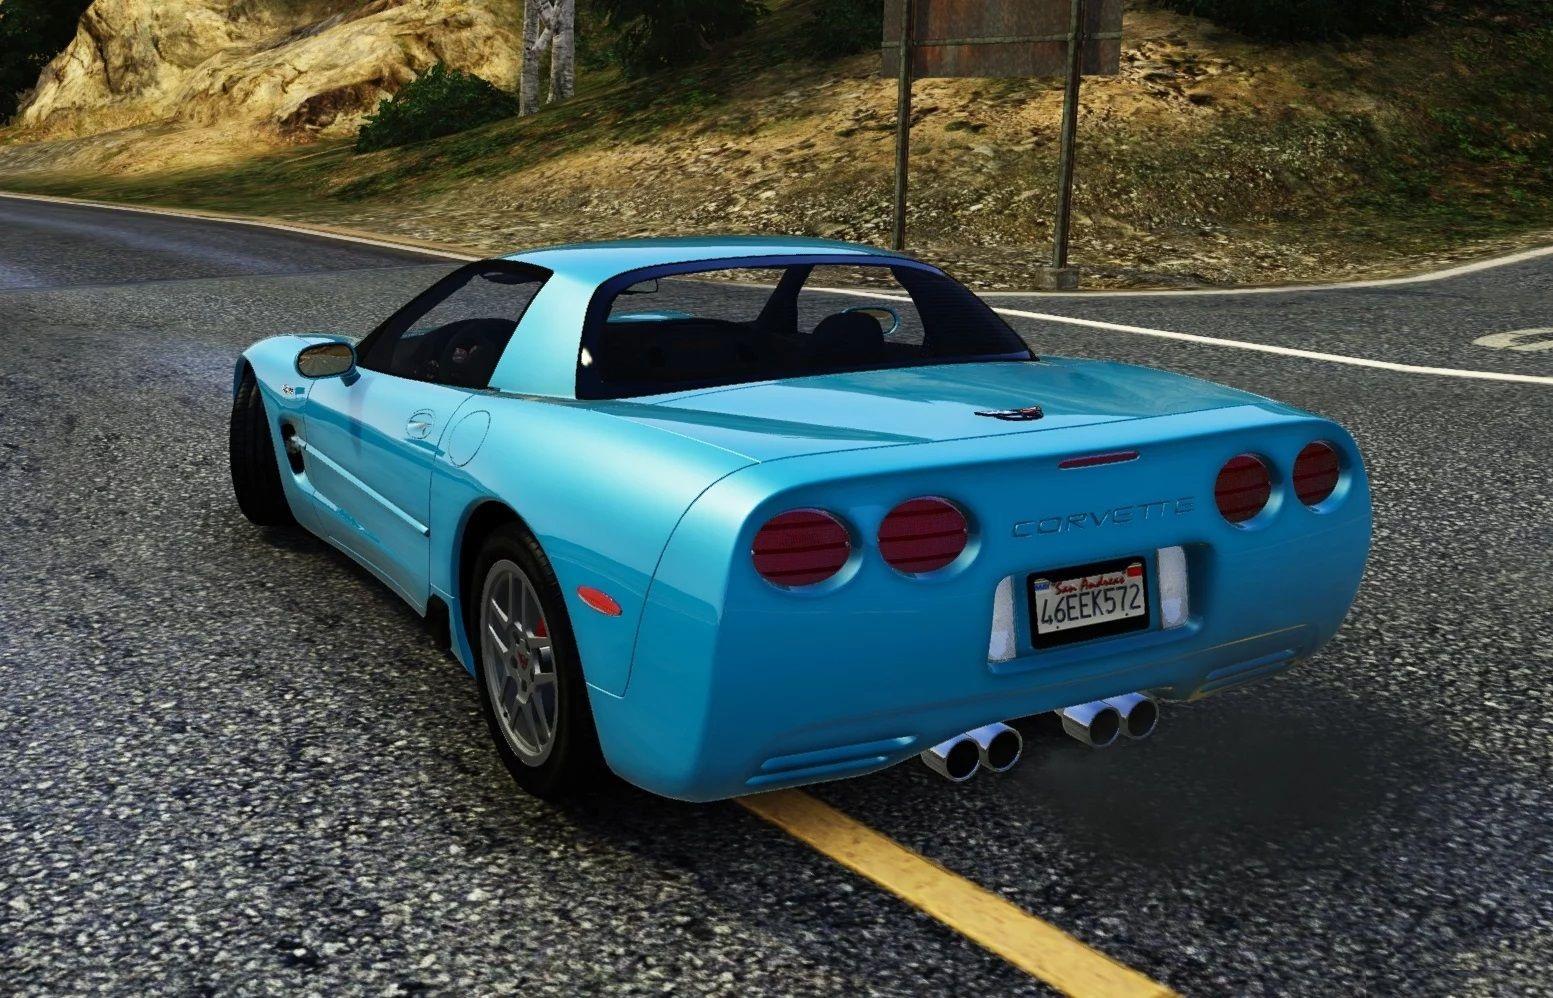 15761734033986_673ade-5.jpg - Grand Theft Auto 5